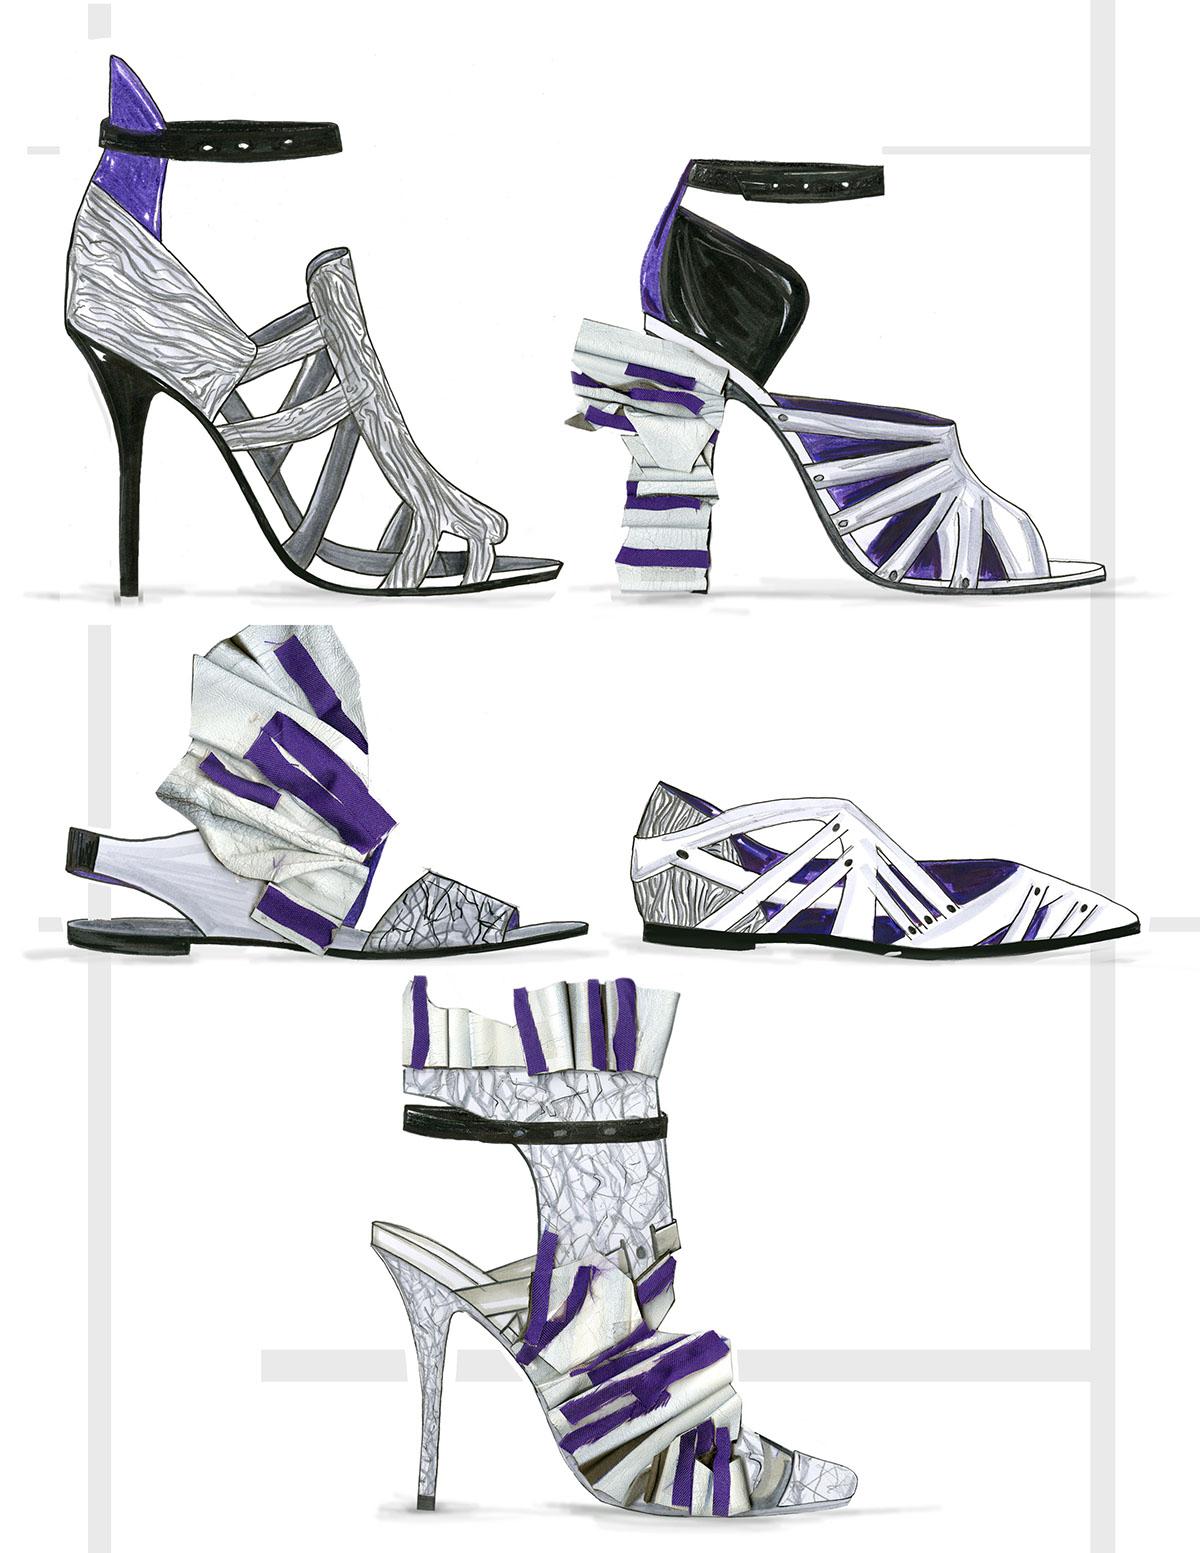 footwear S/S 2017 accessory design heels Sandals ballerina Mushrooms mondrian